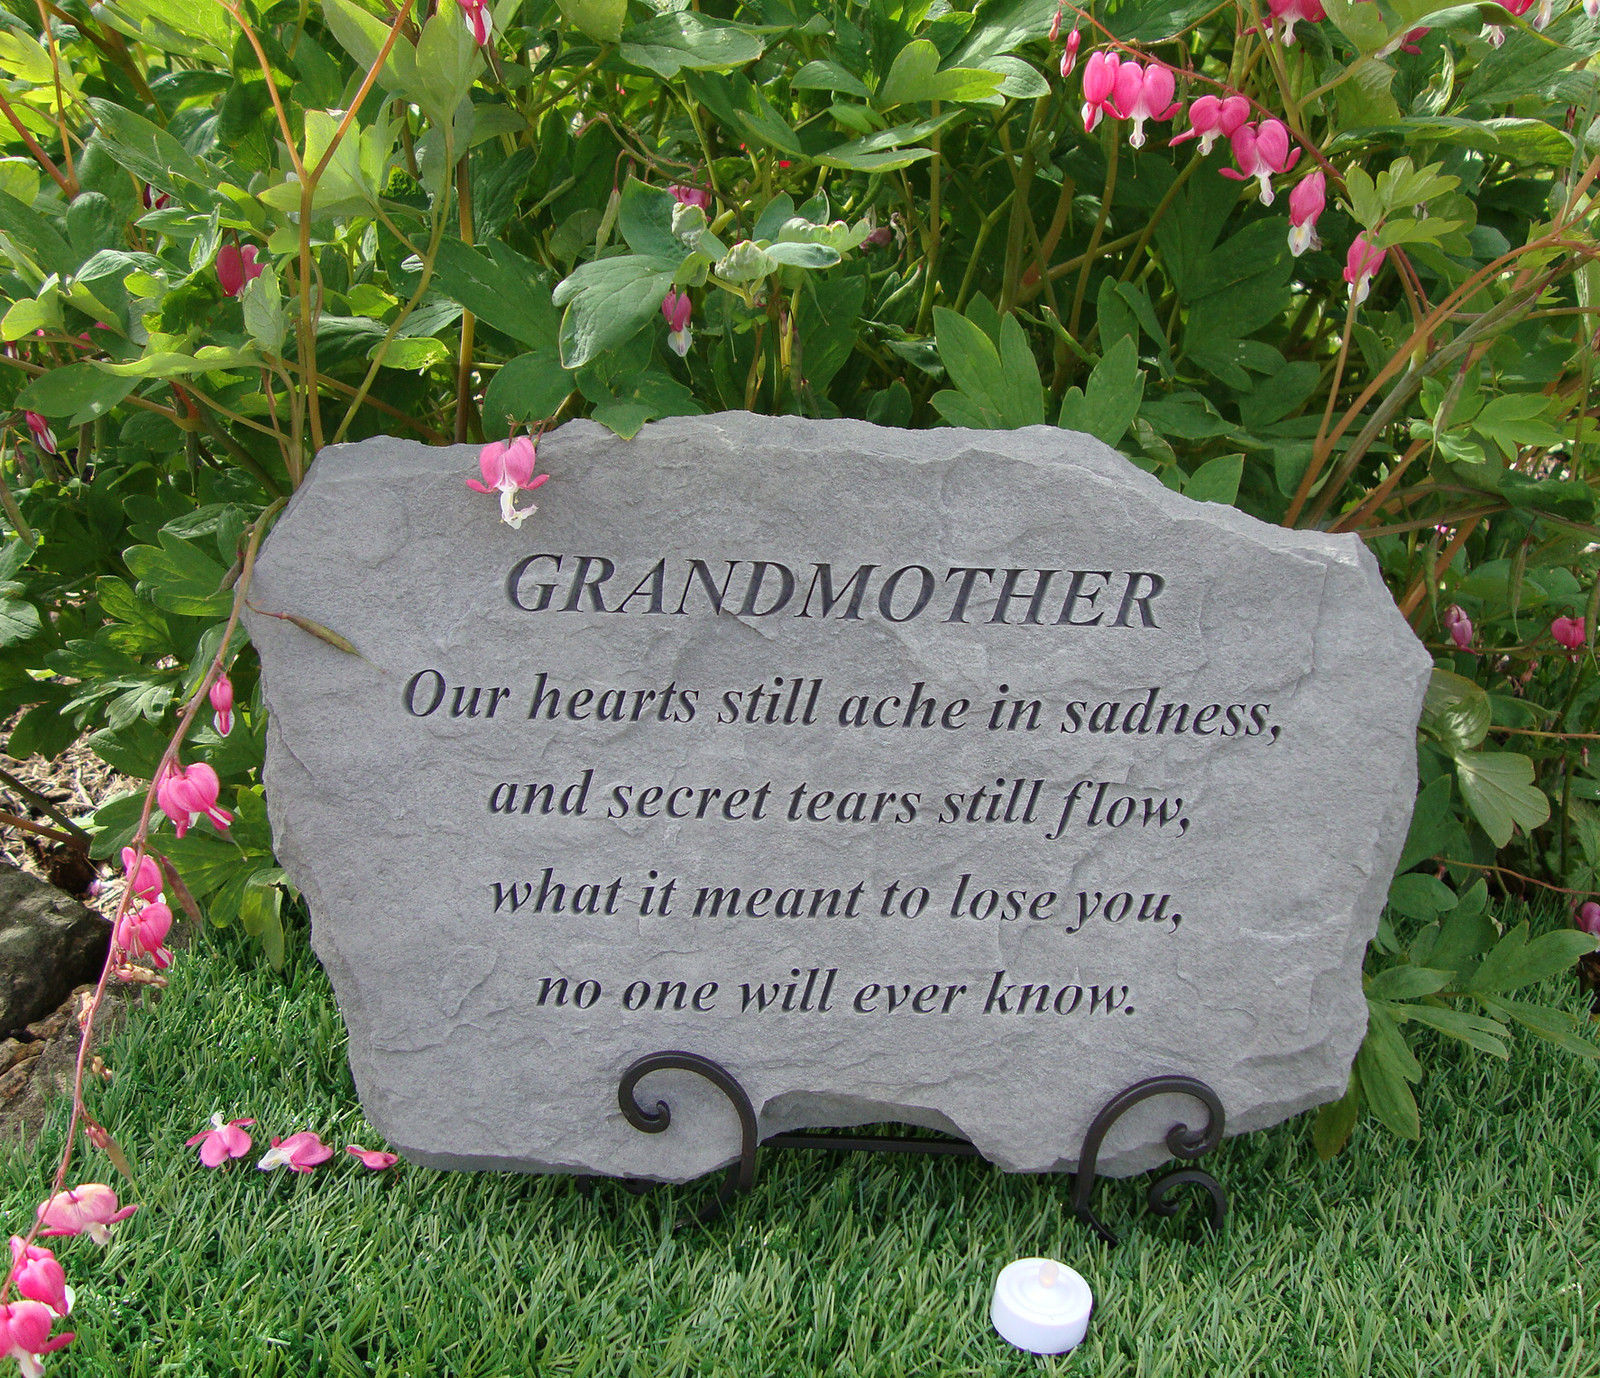 Christmas Grave Decorations Uk: Grandmother Grandma Memorial Garden Stone Plaque Grave